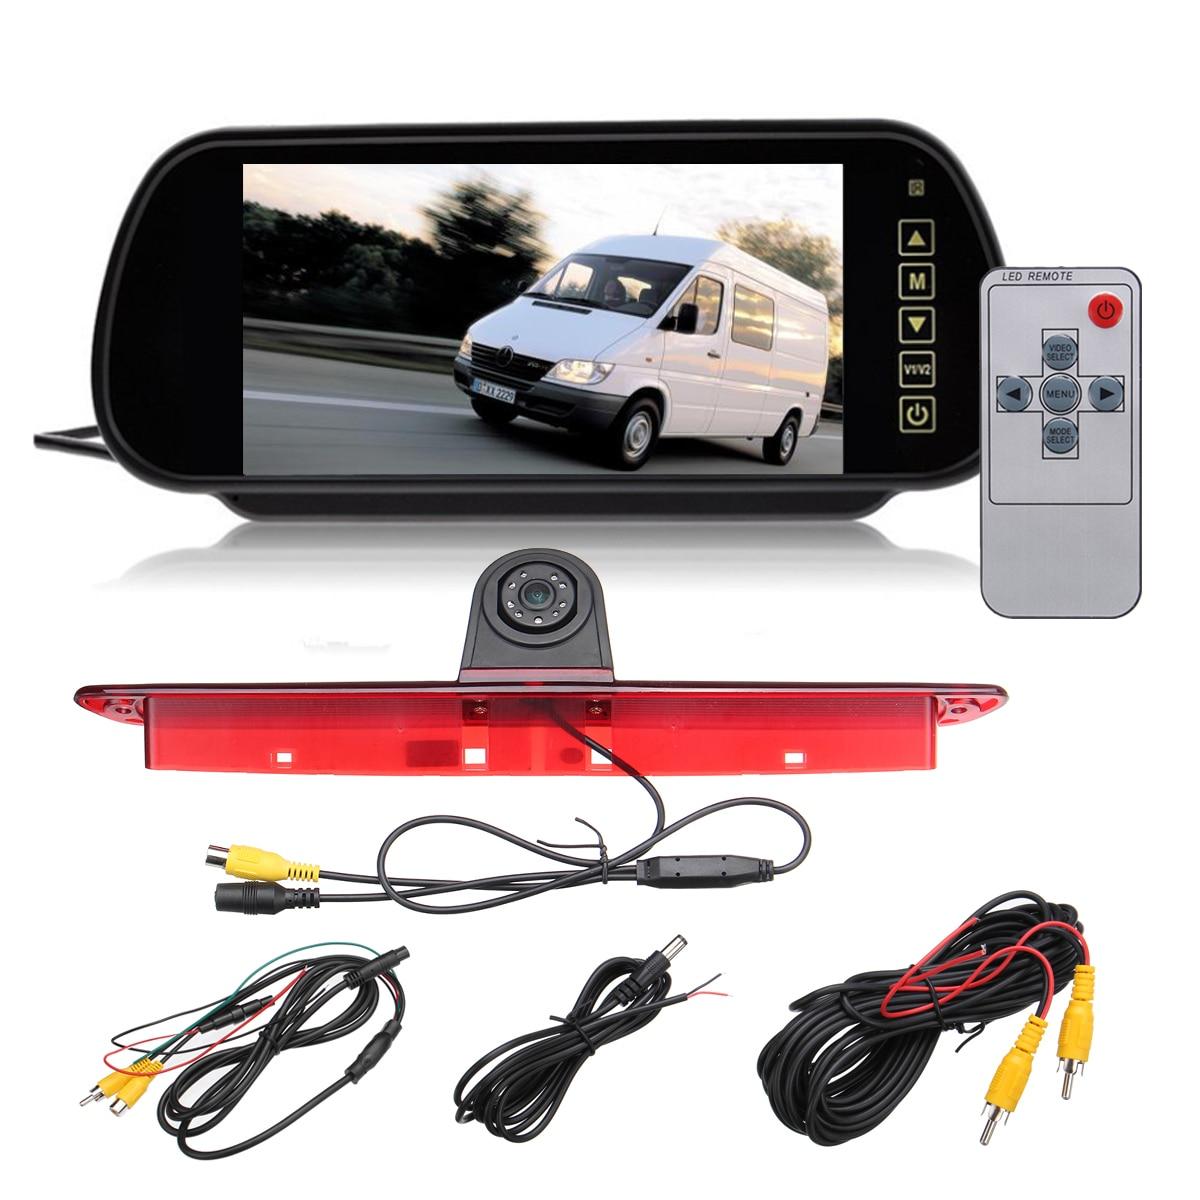 New Car Backup View Camera Brake Light IR Rear View Reversing Camera 7 inch Rearview Display Monitor Kit for Mercedes Sprinter